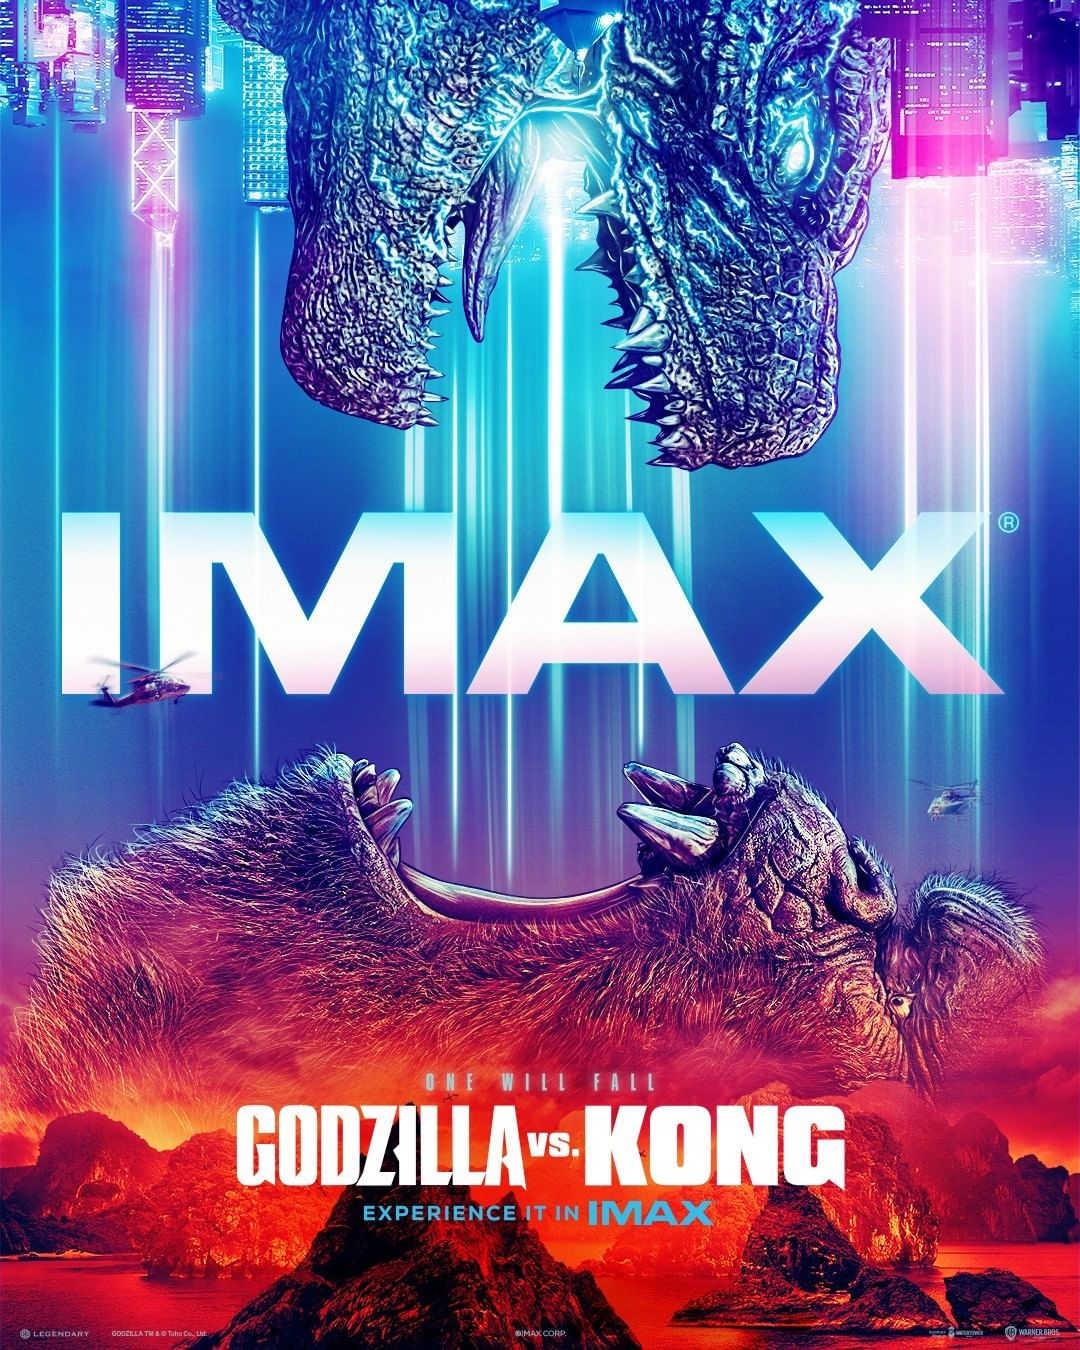 Godzilla Vs. Kong IMAX poster